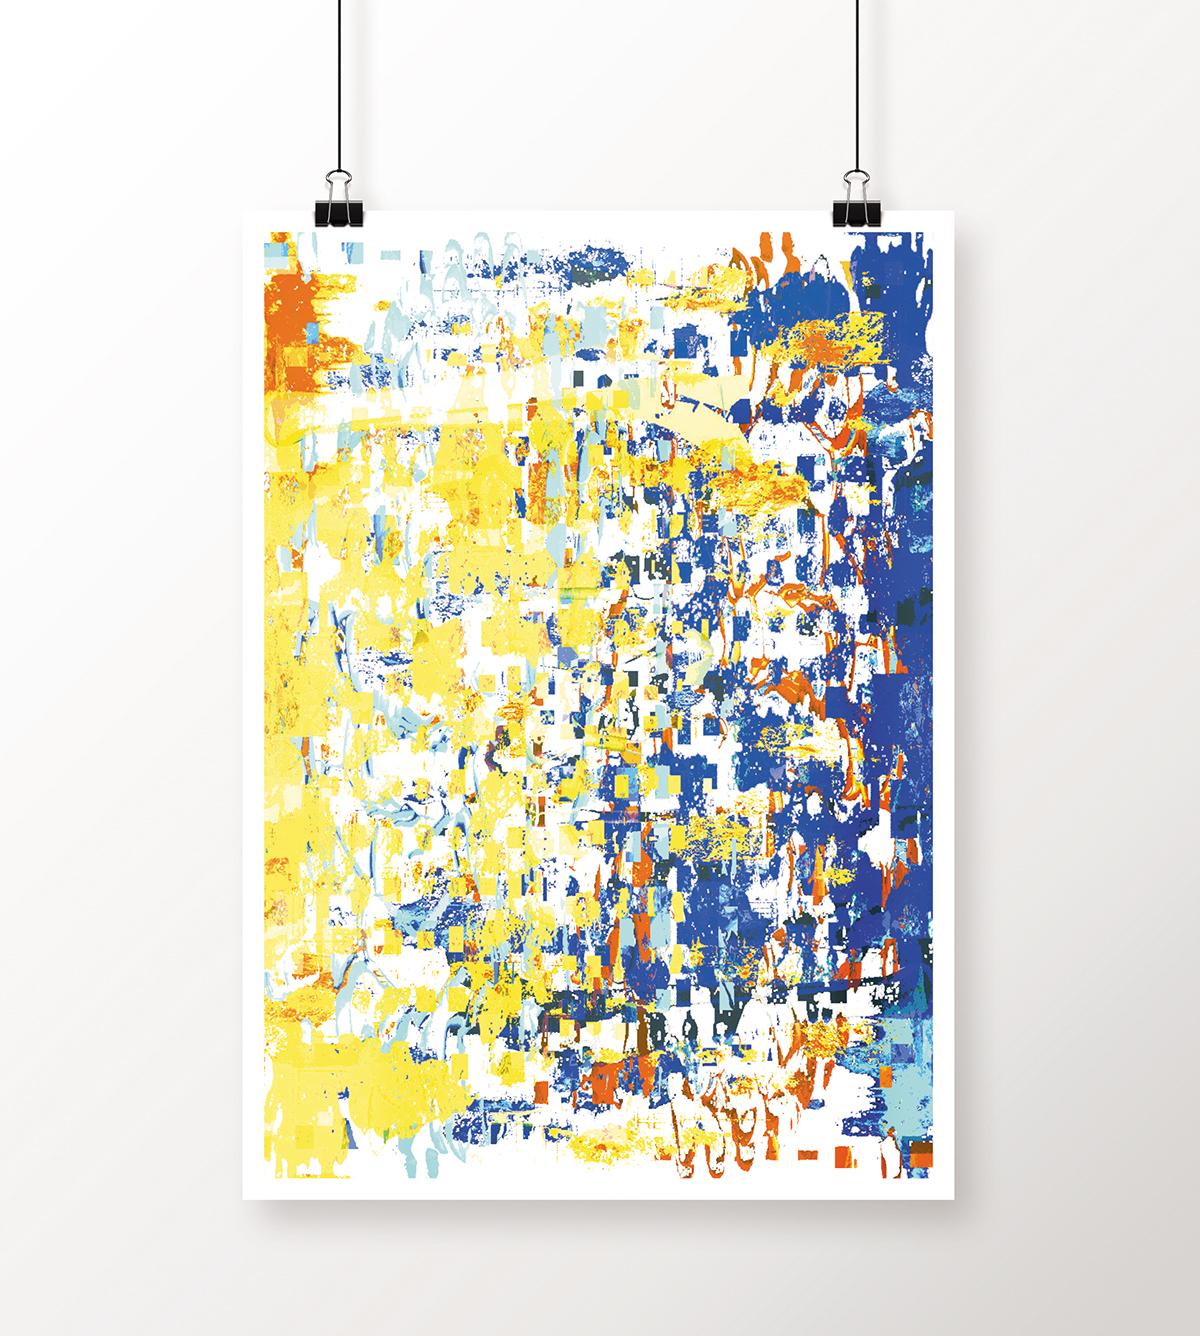 poster abstract digital